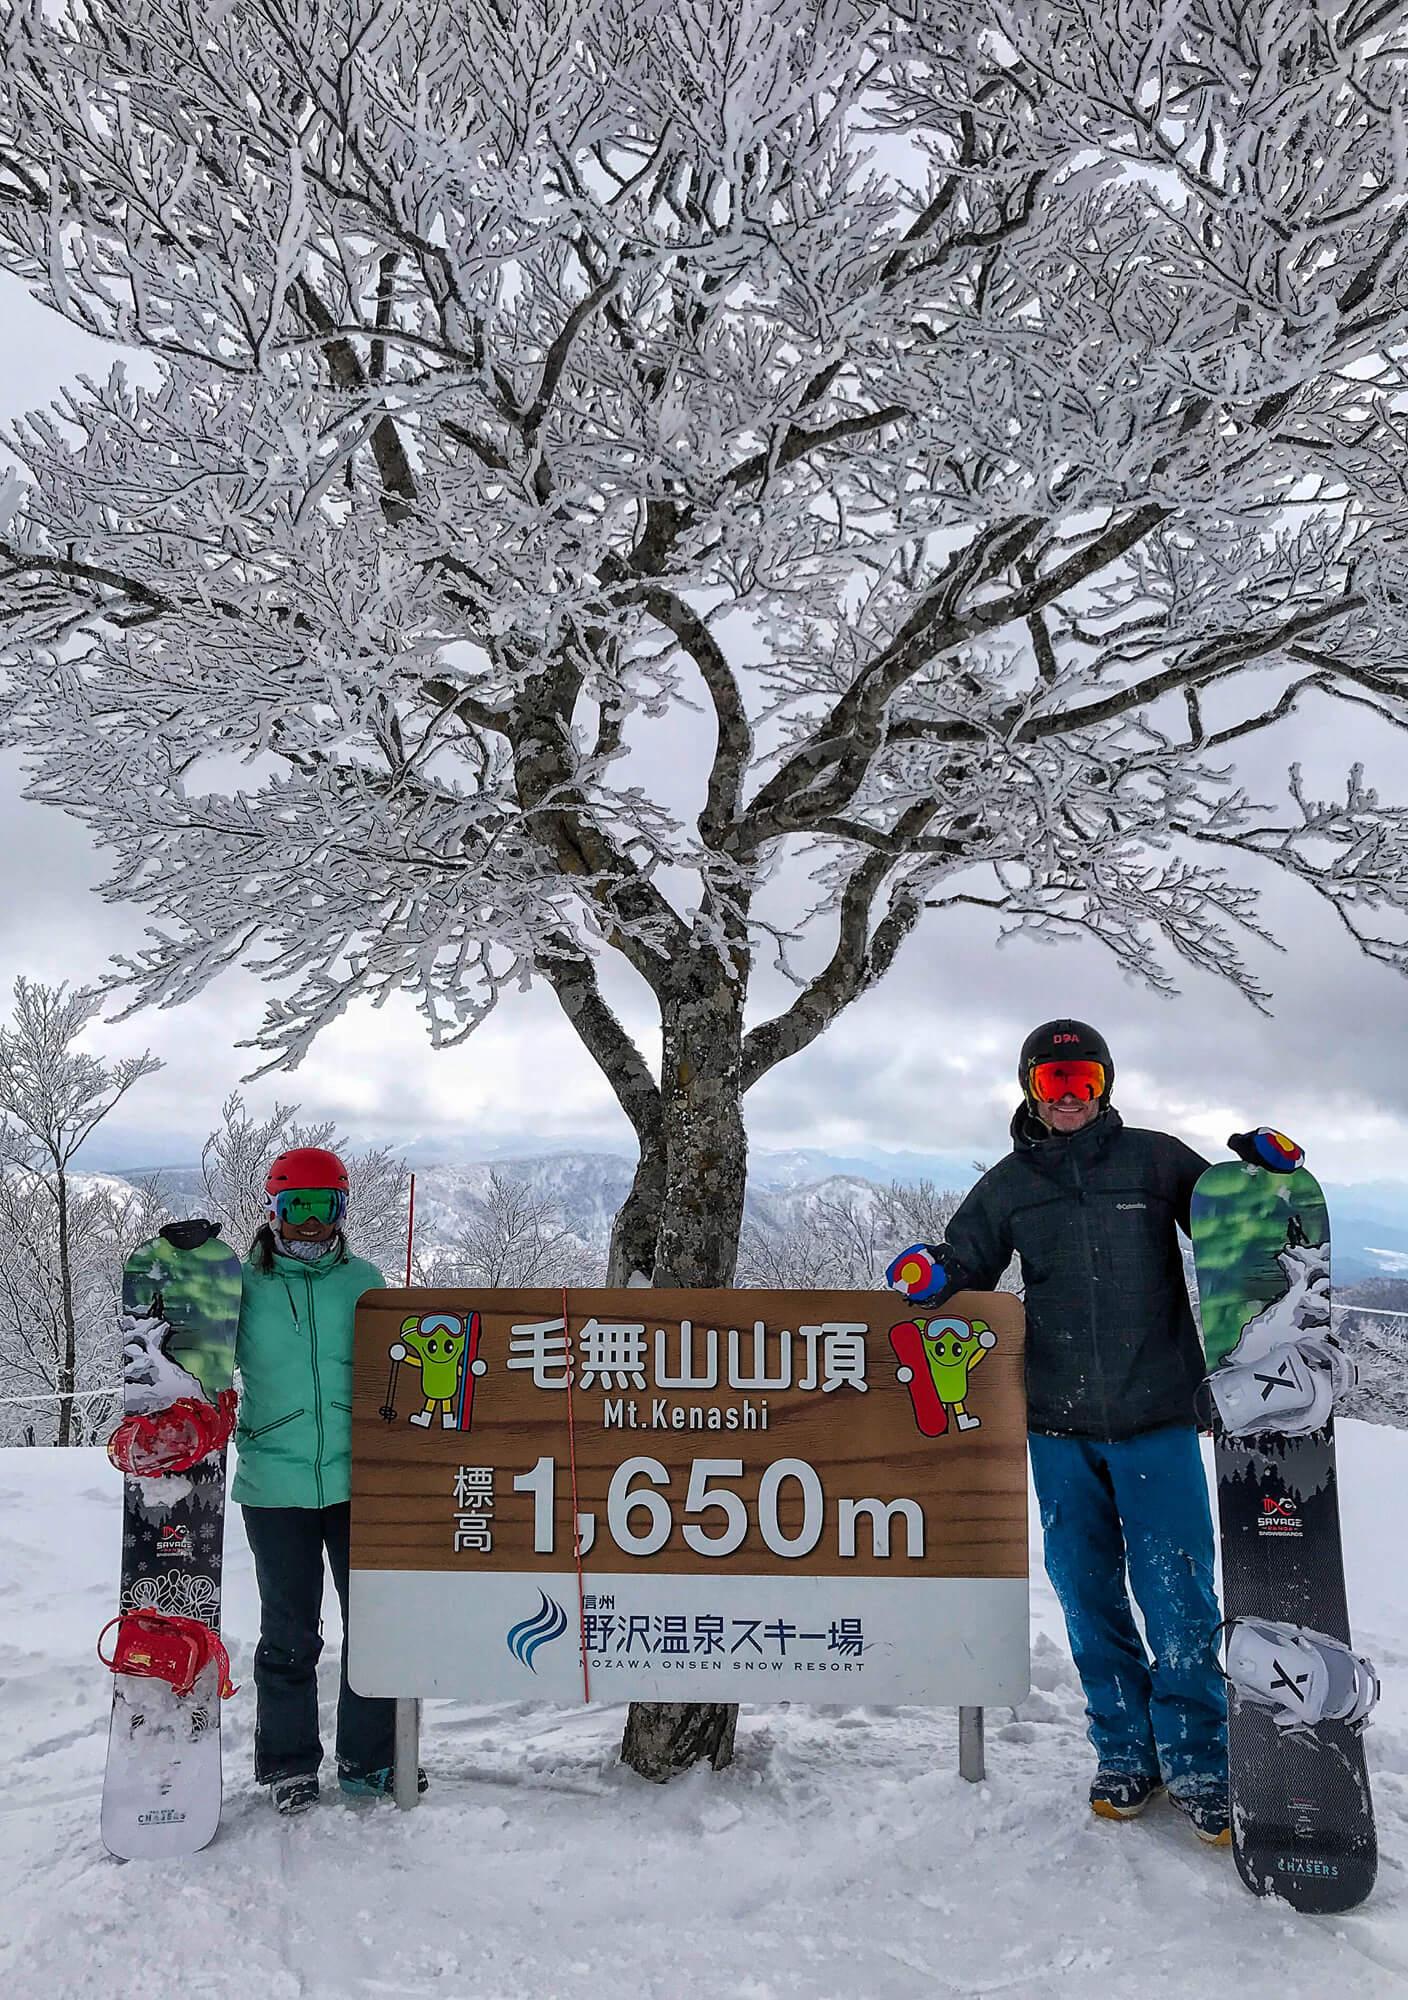 THE TOP OF MT KENASHI